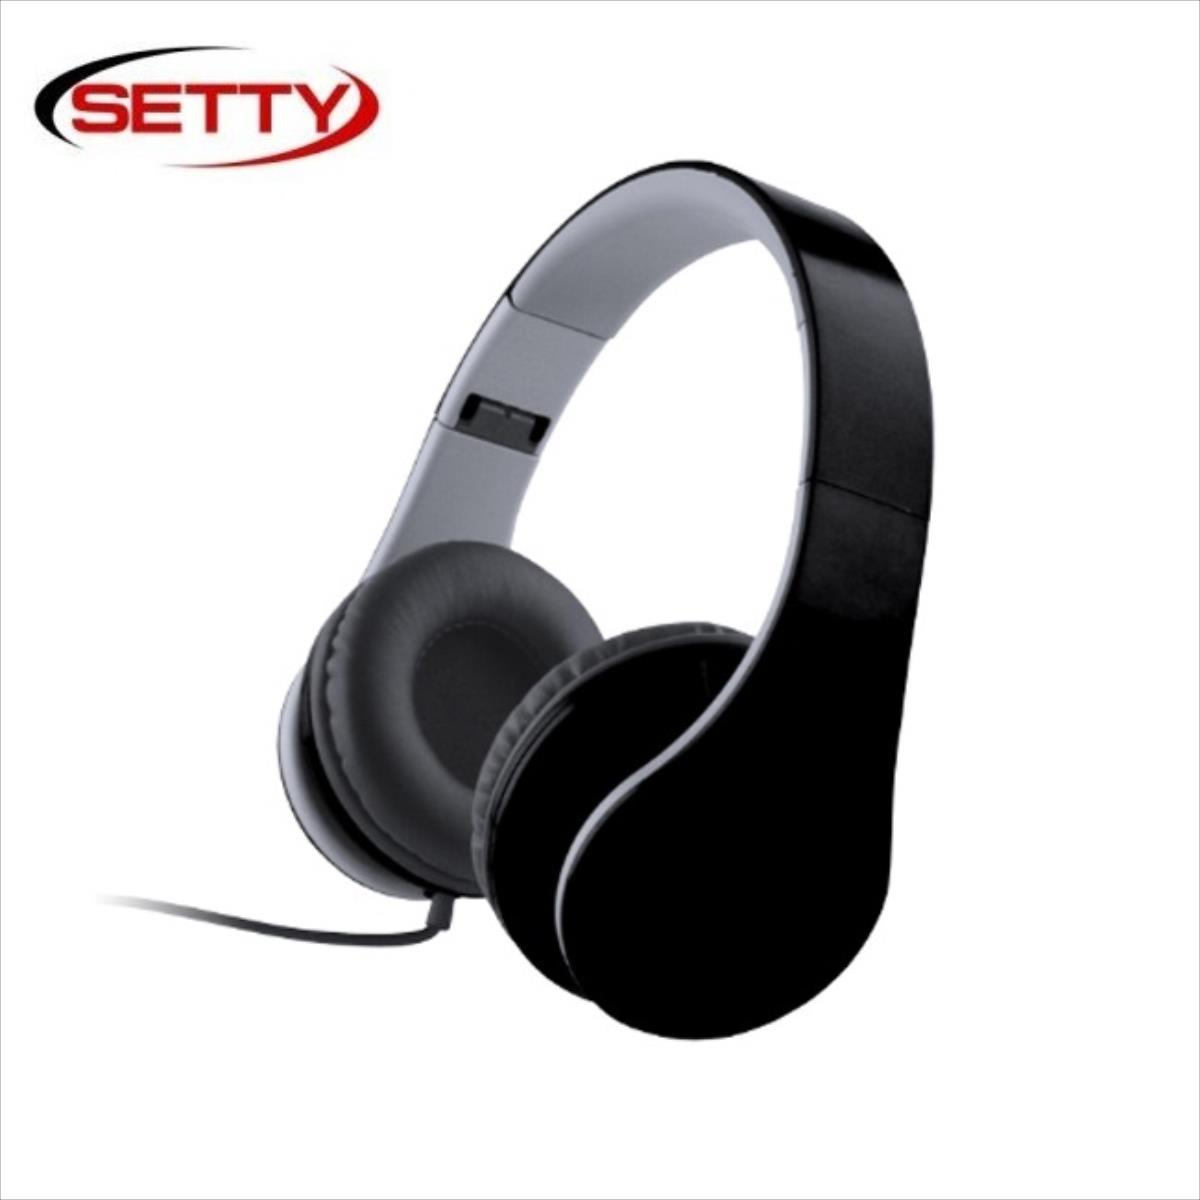 Setty X-Bass Music Austiņas On-ear 40mm Driver Salokāmas 3.5mm plakans 1.6m Vads Melnas austiņas